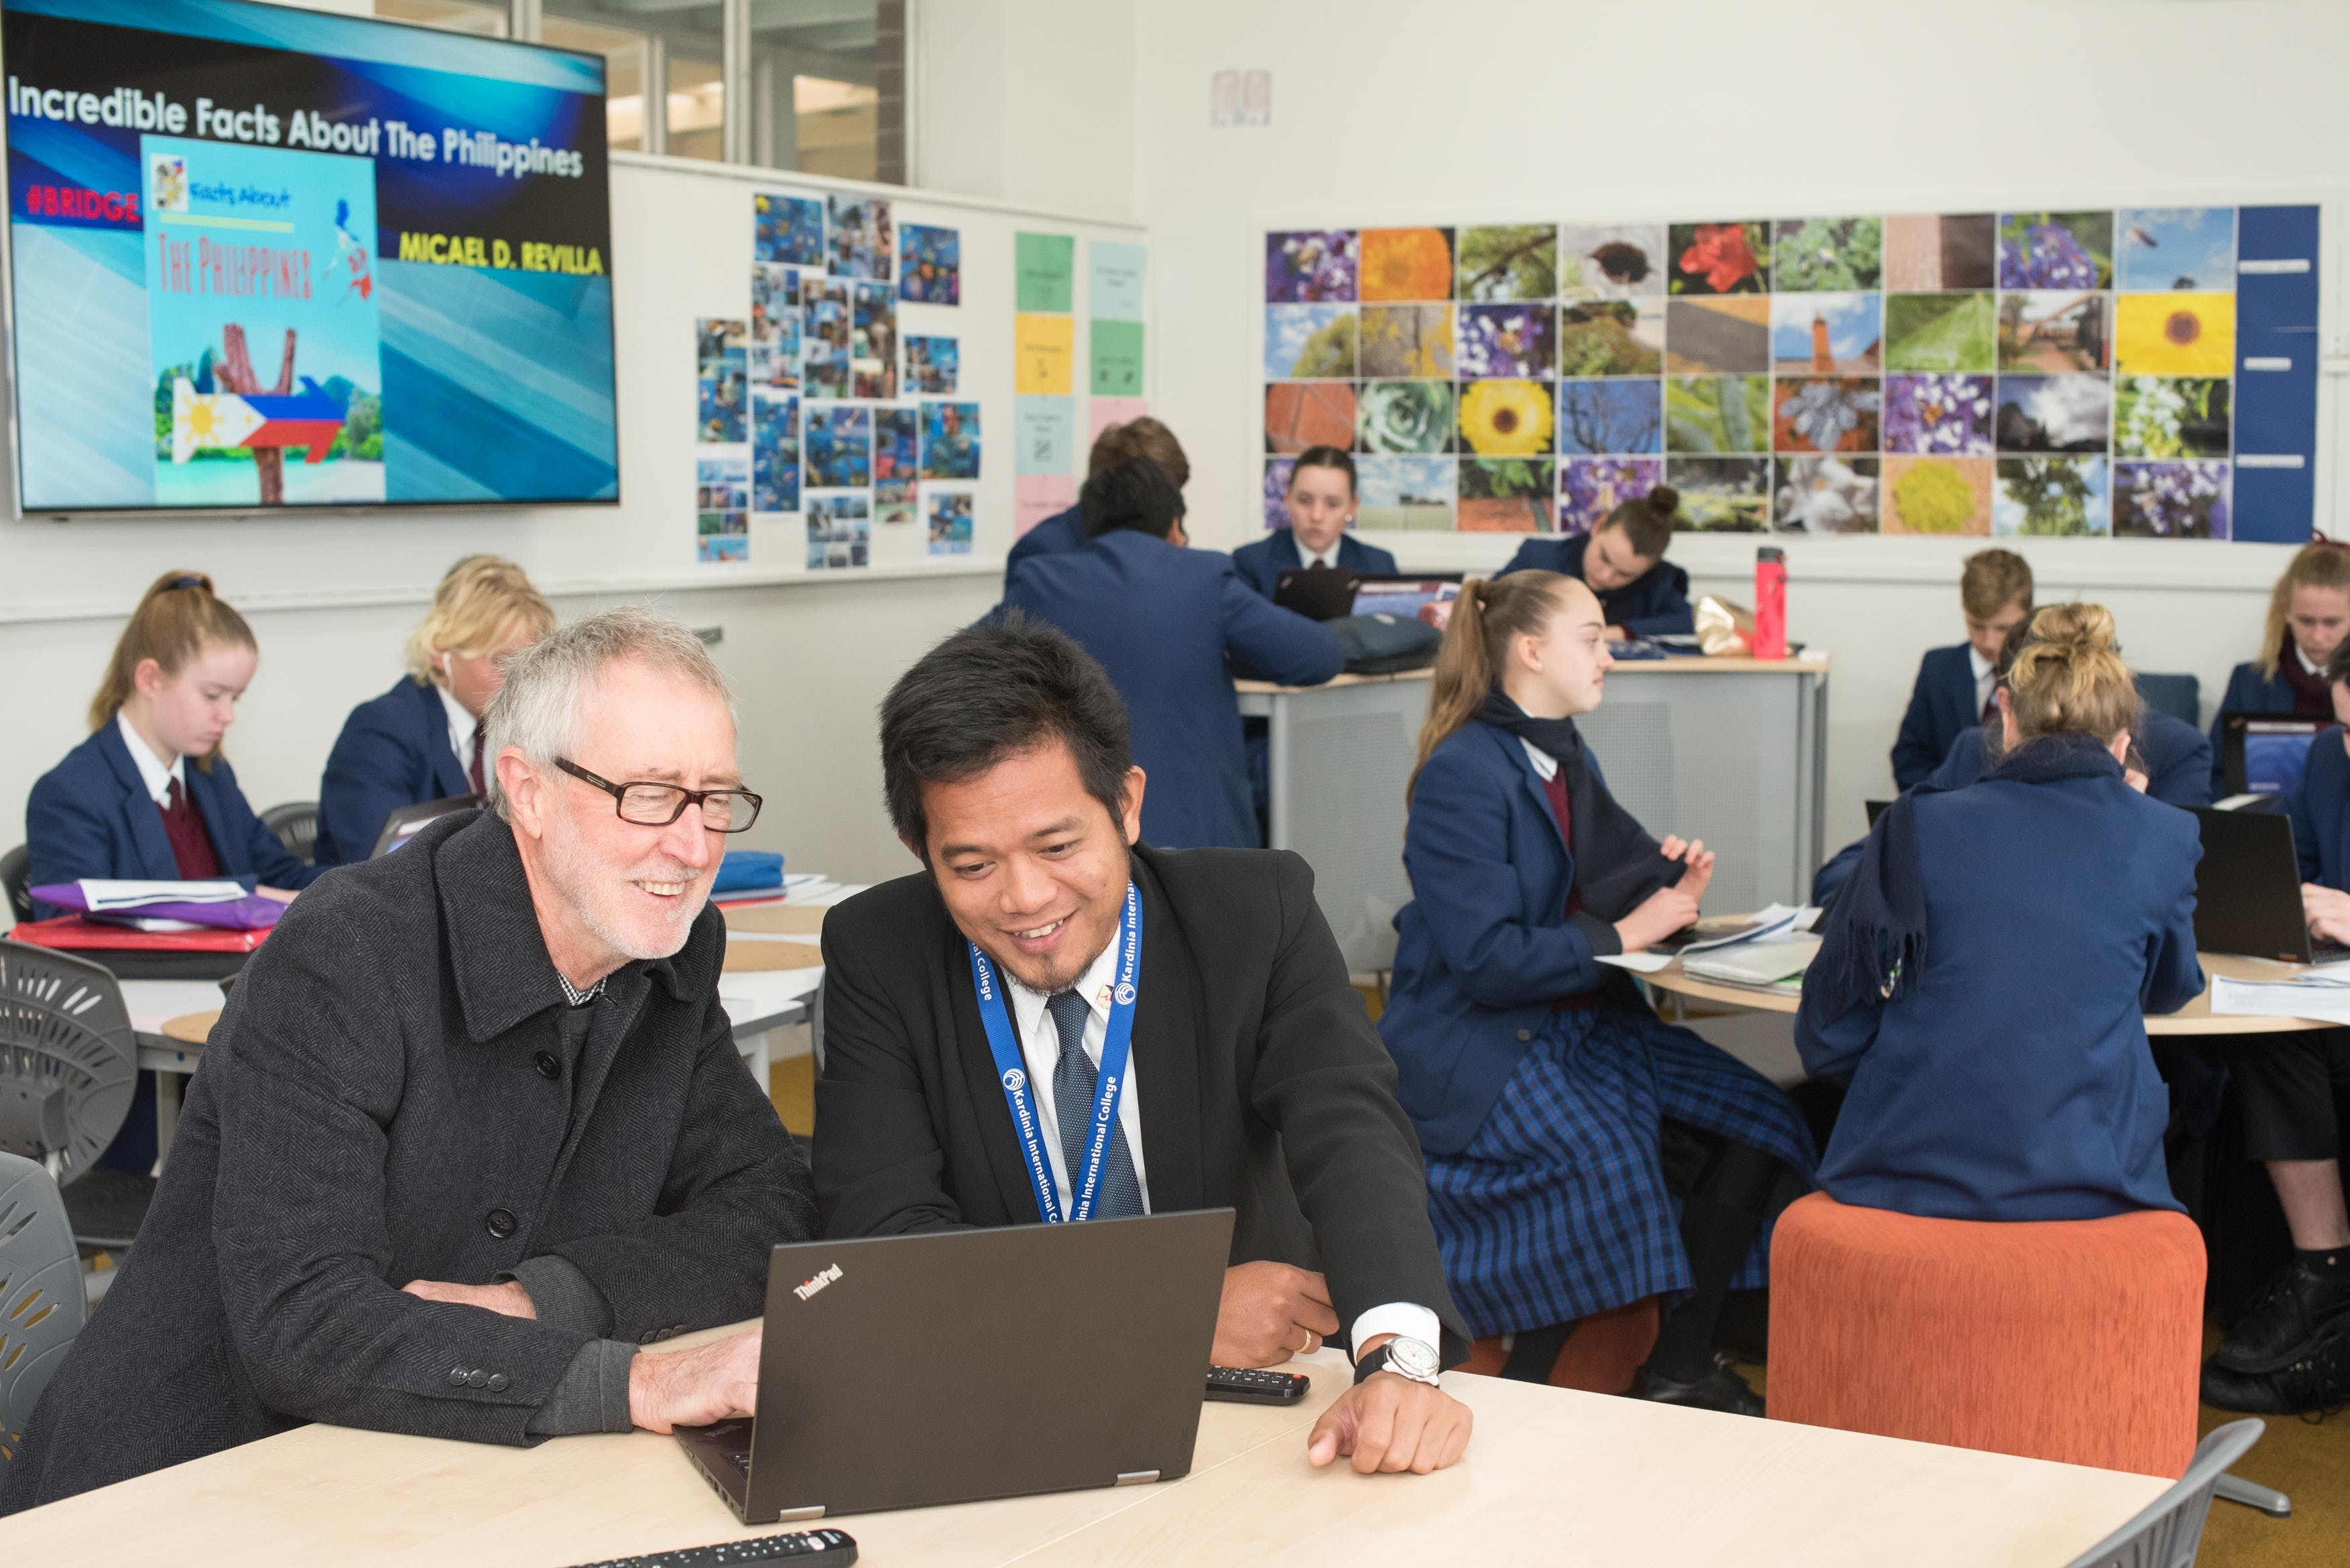 Australia-Asia BRIDGE Expansion Program Online Community of Practice (SA) 2